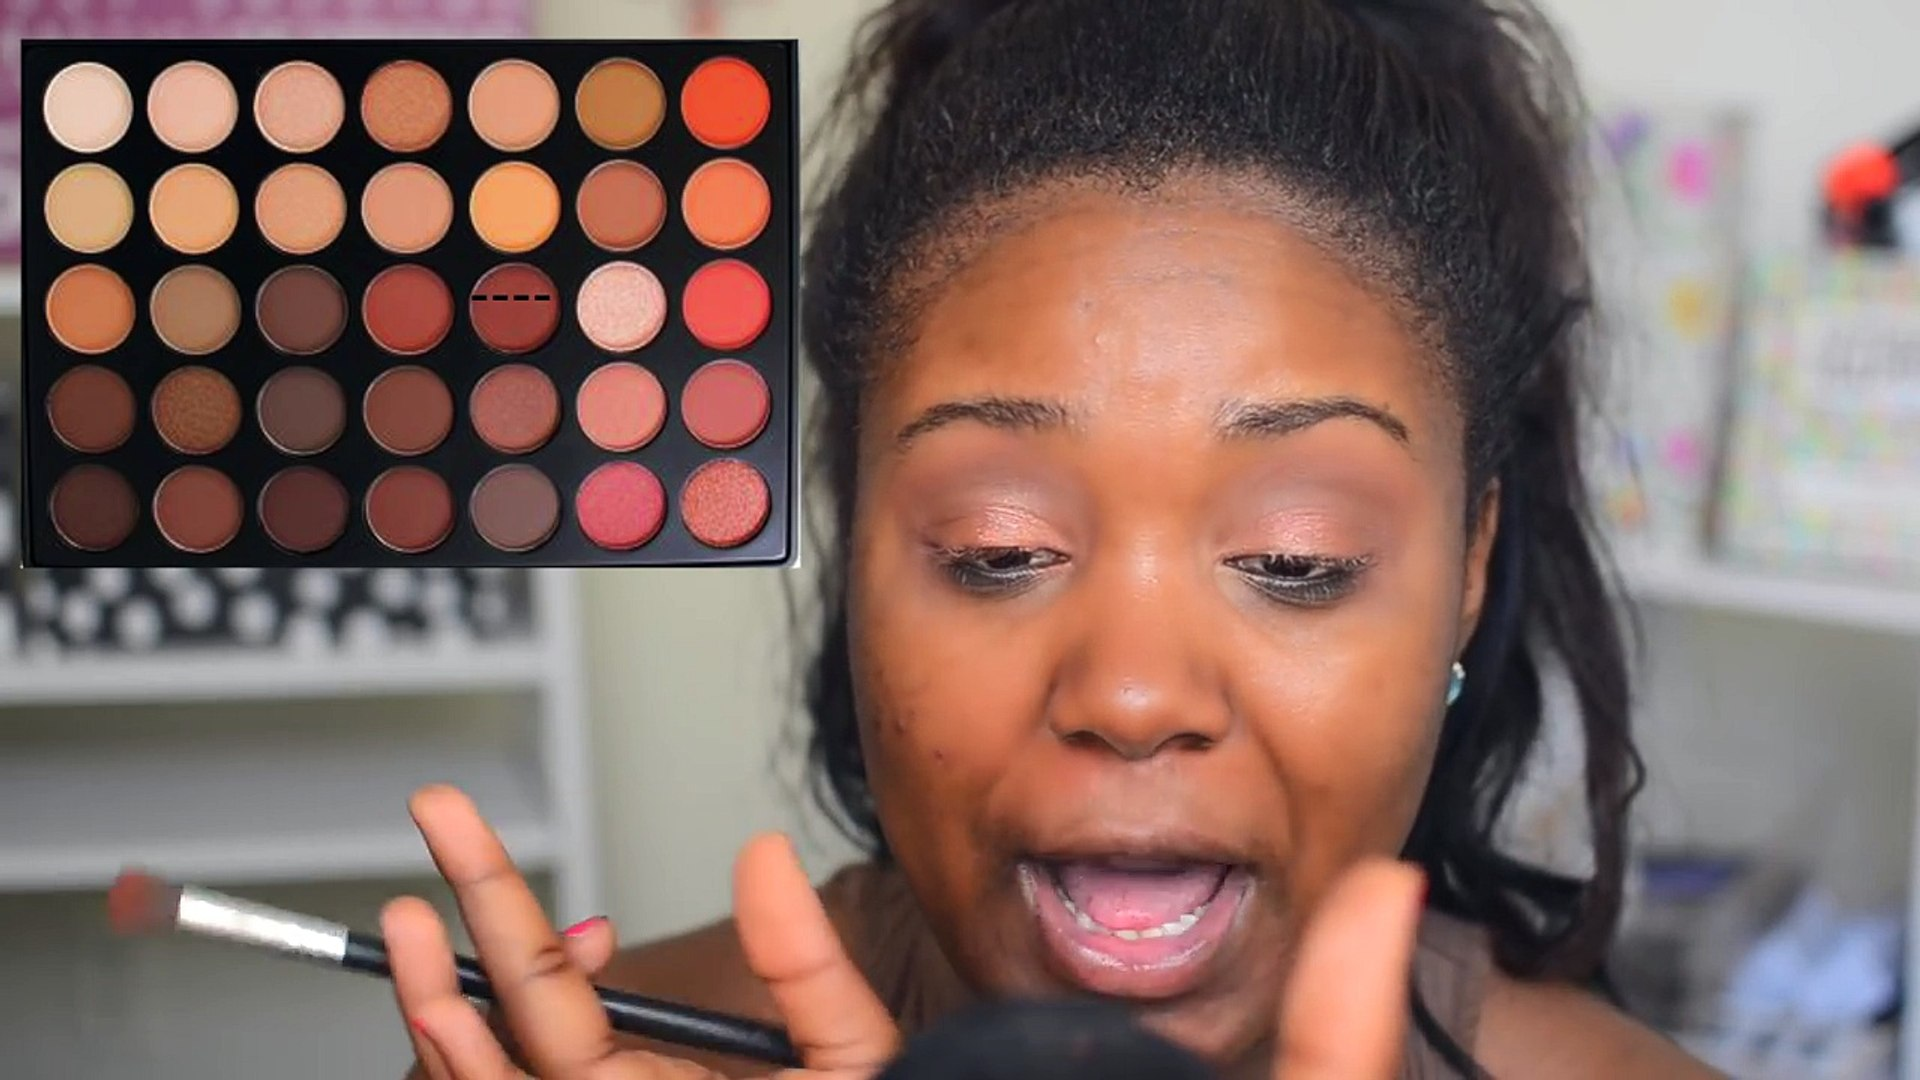 Dramatic Summer Night Makeup Tutorial I Flawless Foundation Routine For Black Women Dark Skin 2016 Video Dailymotion